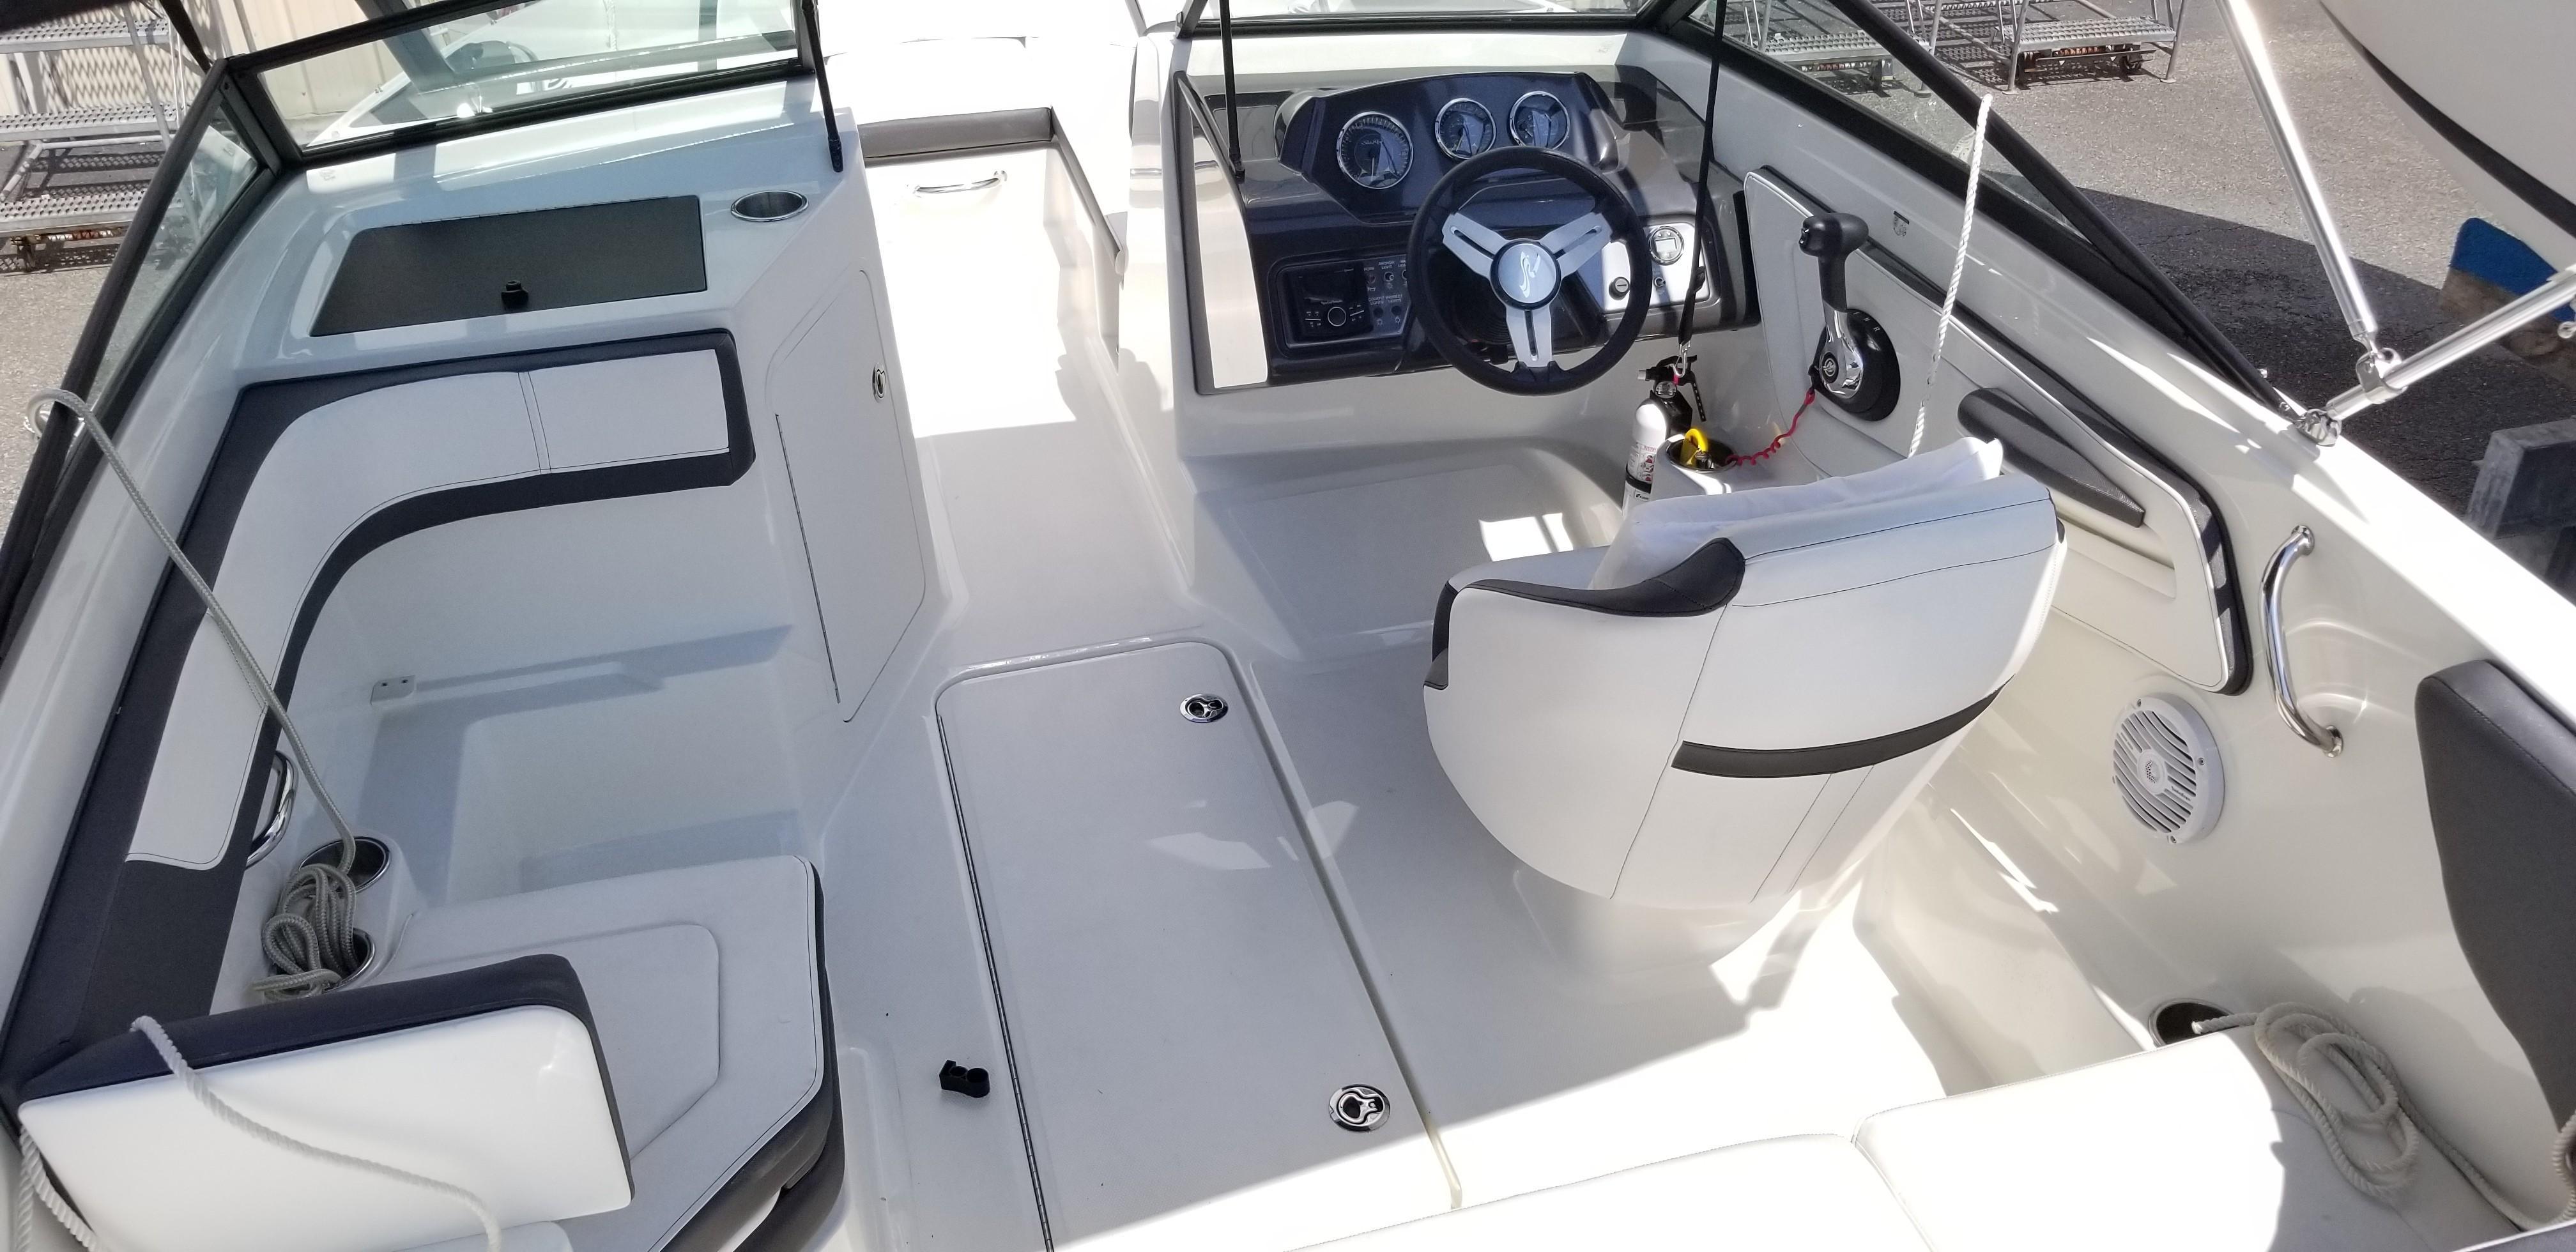 Sea RaySPX 190 OB